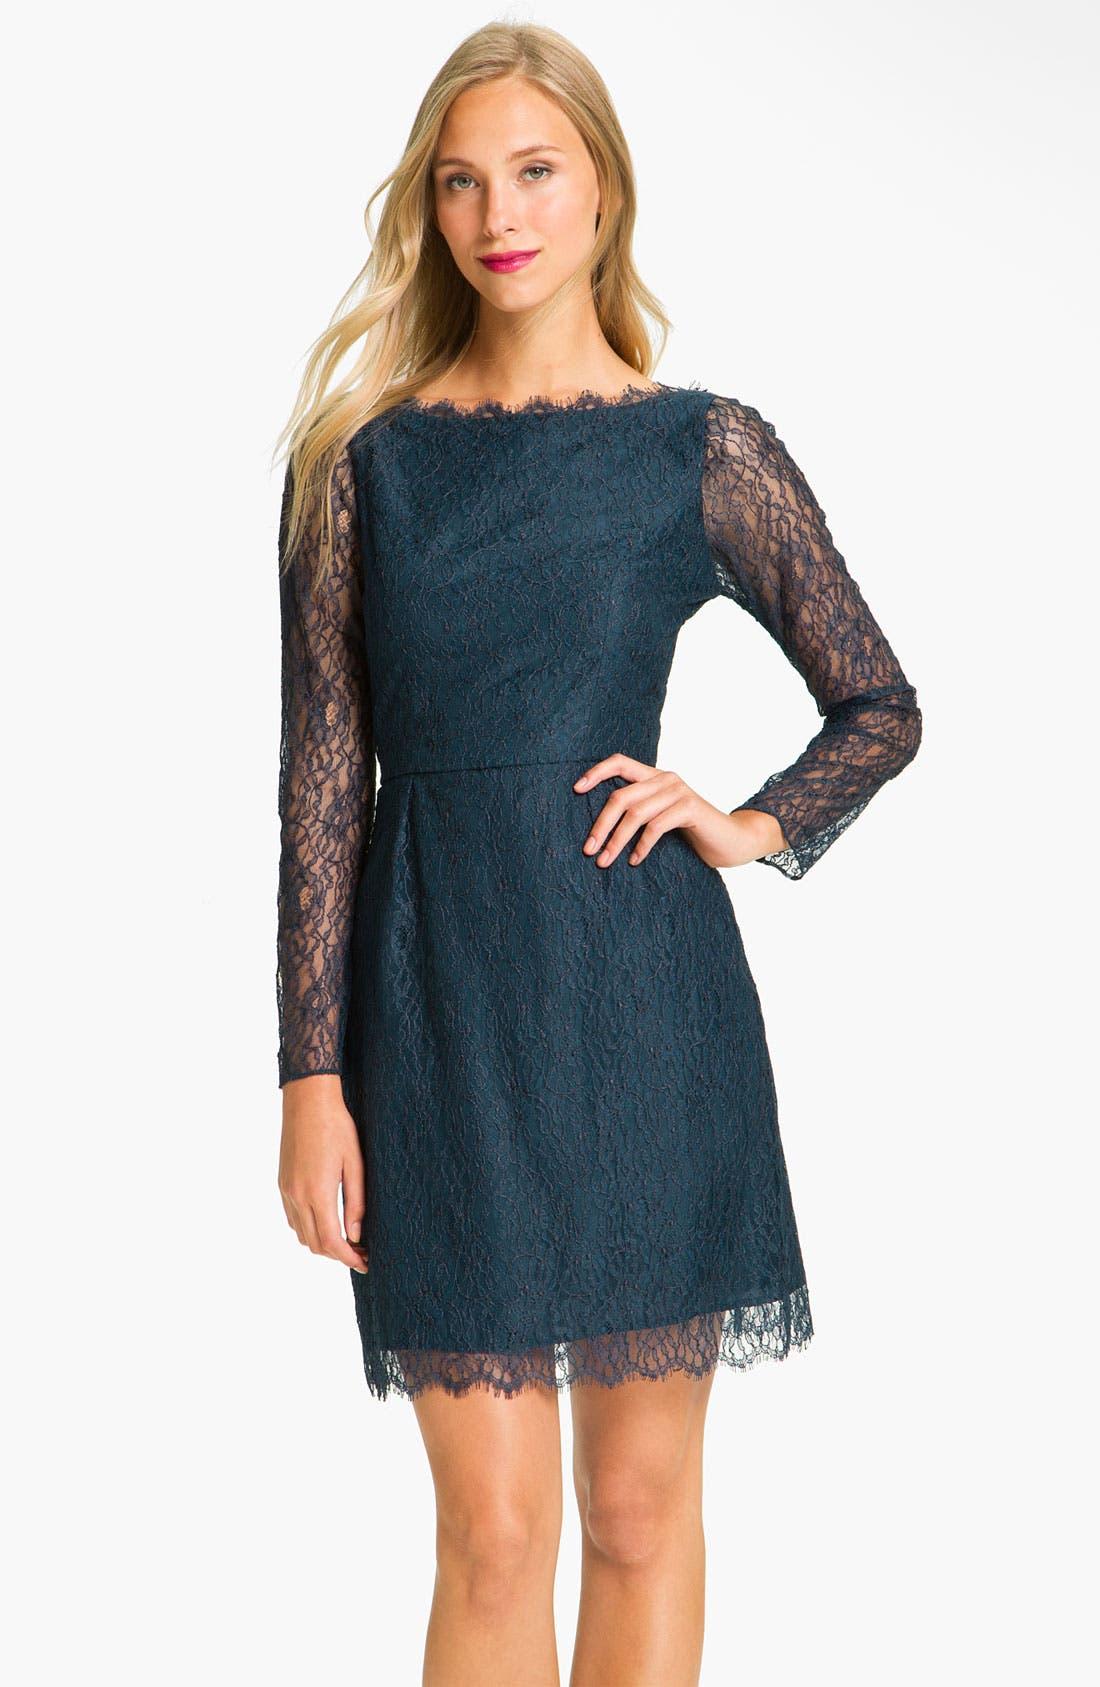 Alternate Image 1 Selected - Shoshanna 'Minka' Long Sleeve Chantilly Lace Dress